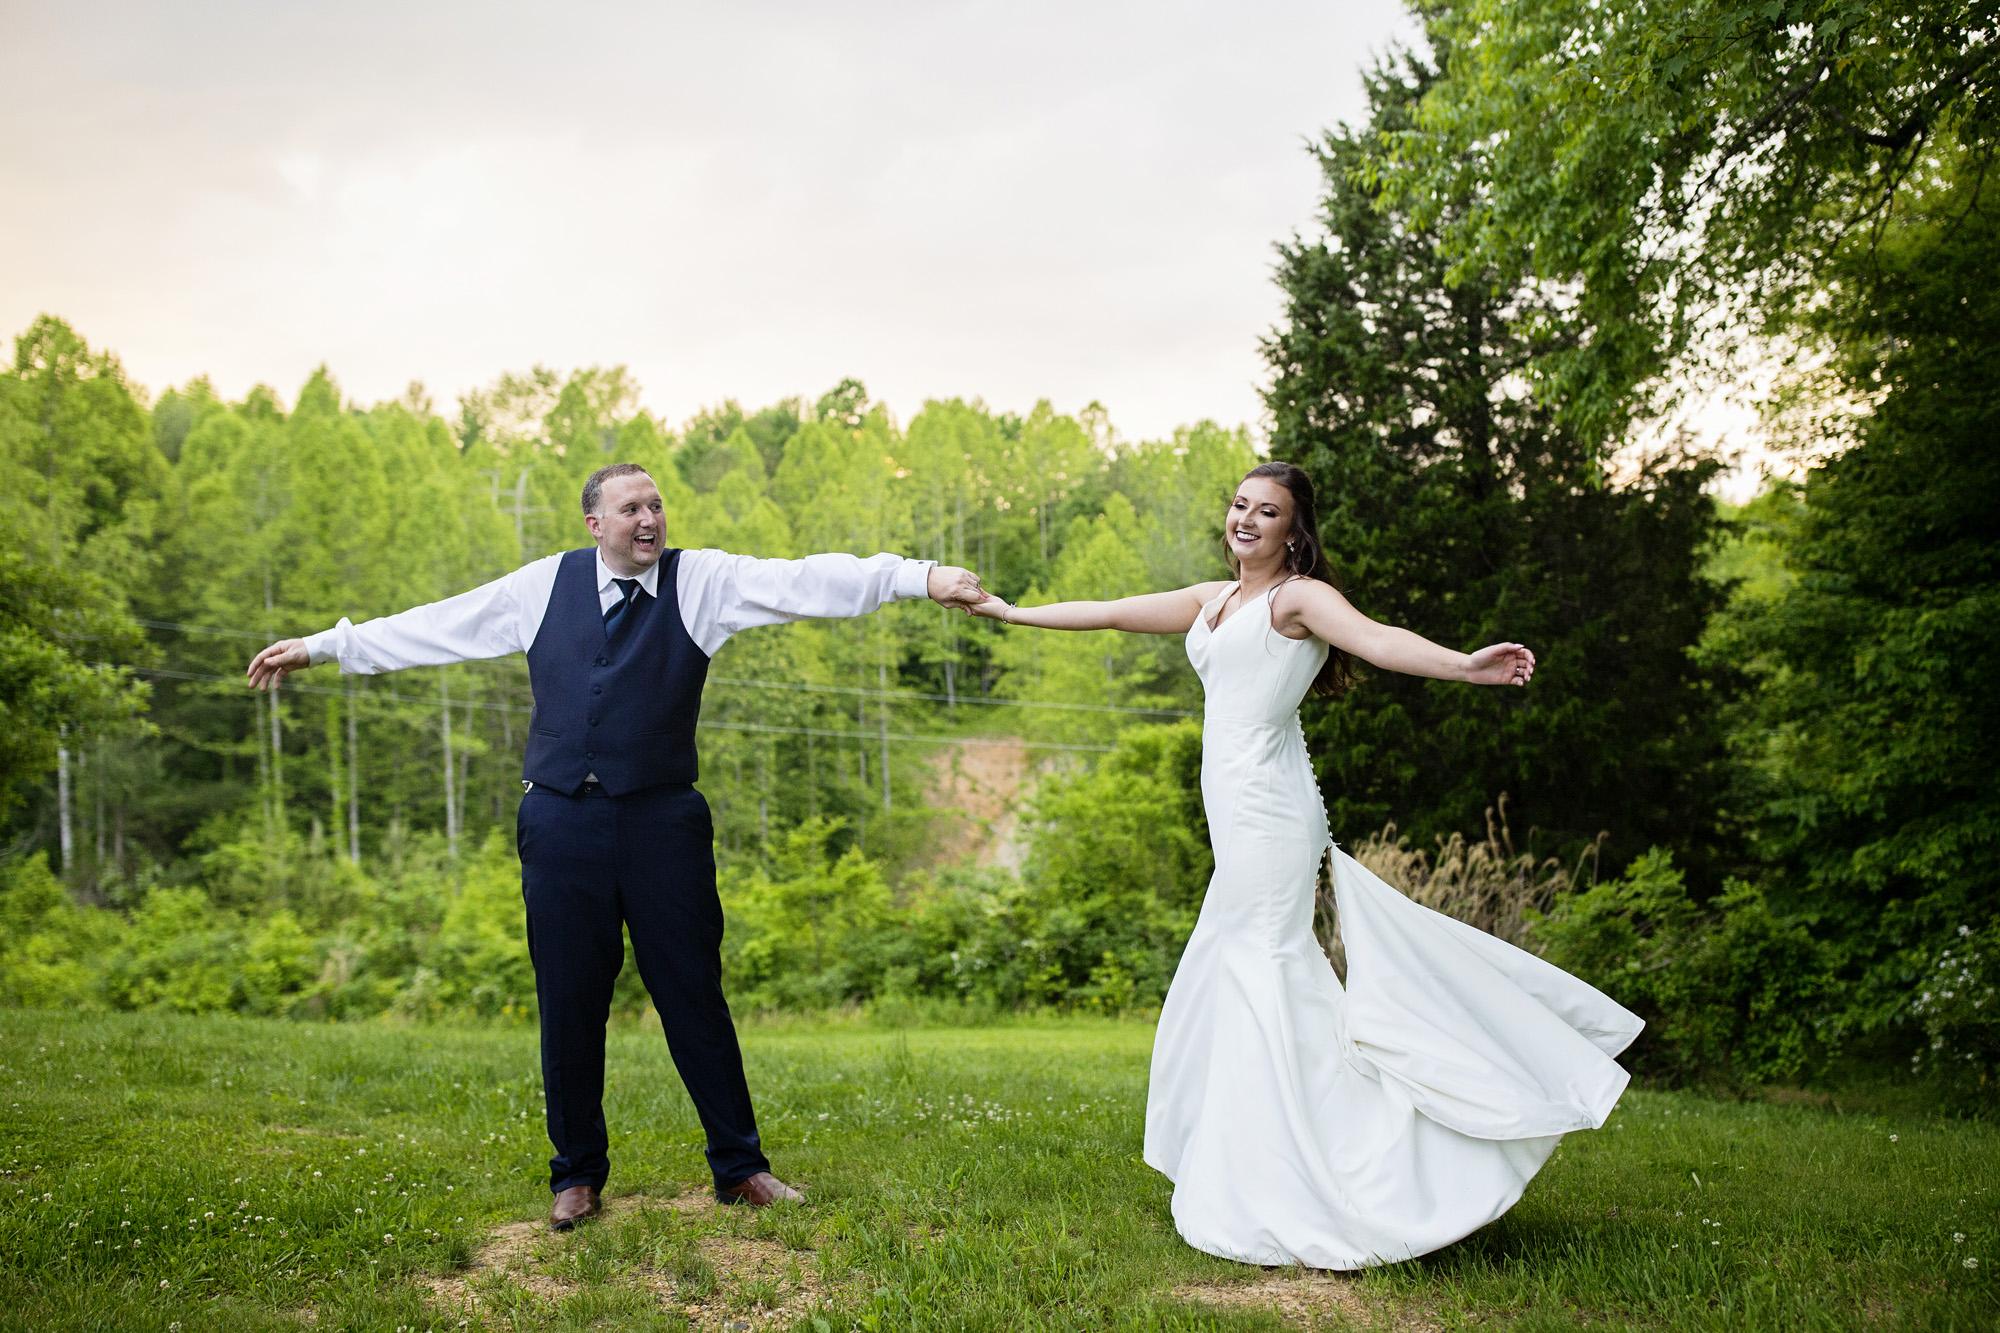 Seriously_Sabrina_Photography_Red_River_Gorge_Wedding_Barn_Robinson120.jpg